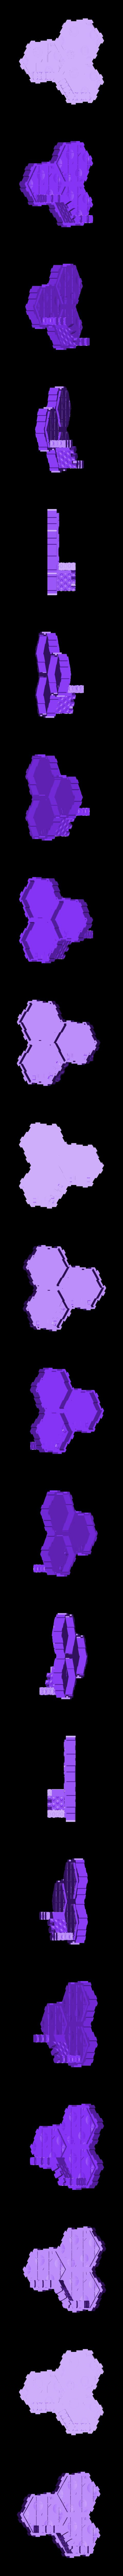 3hex_stone_with_wall_2.stl Download free STL file Locking Hex Terrain Stone Path • 3D print object, mrhers2